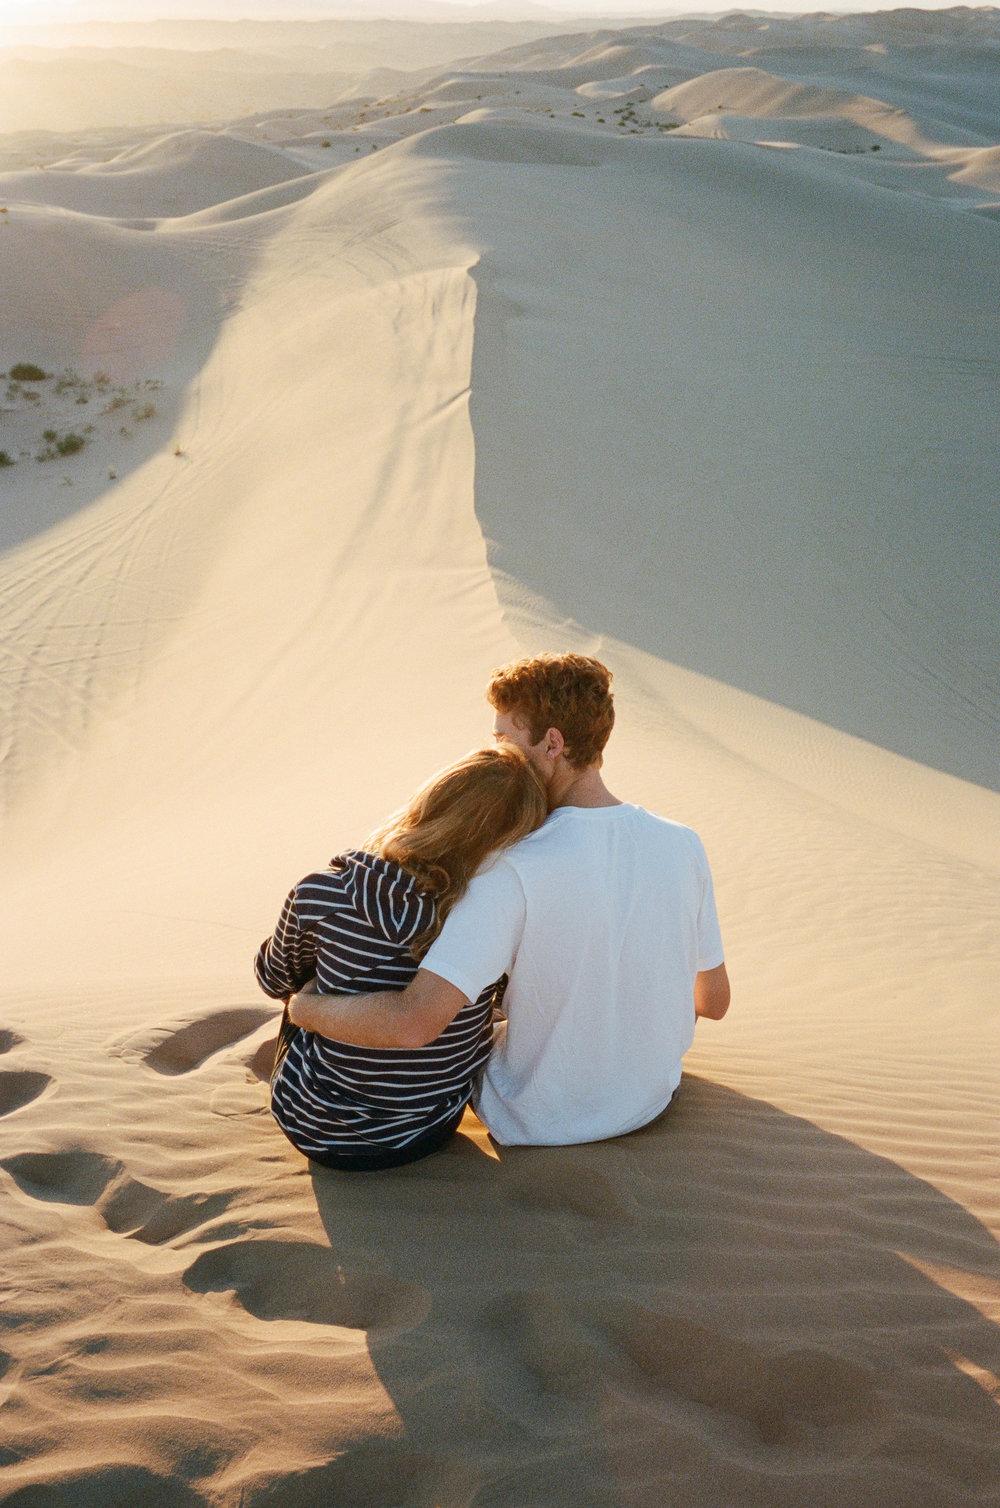 Sand Dunes_#9872-13.jpg